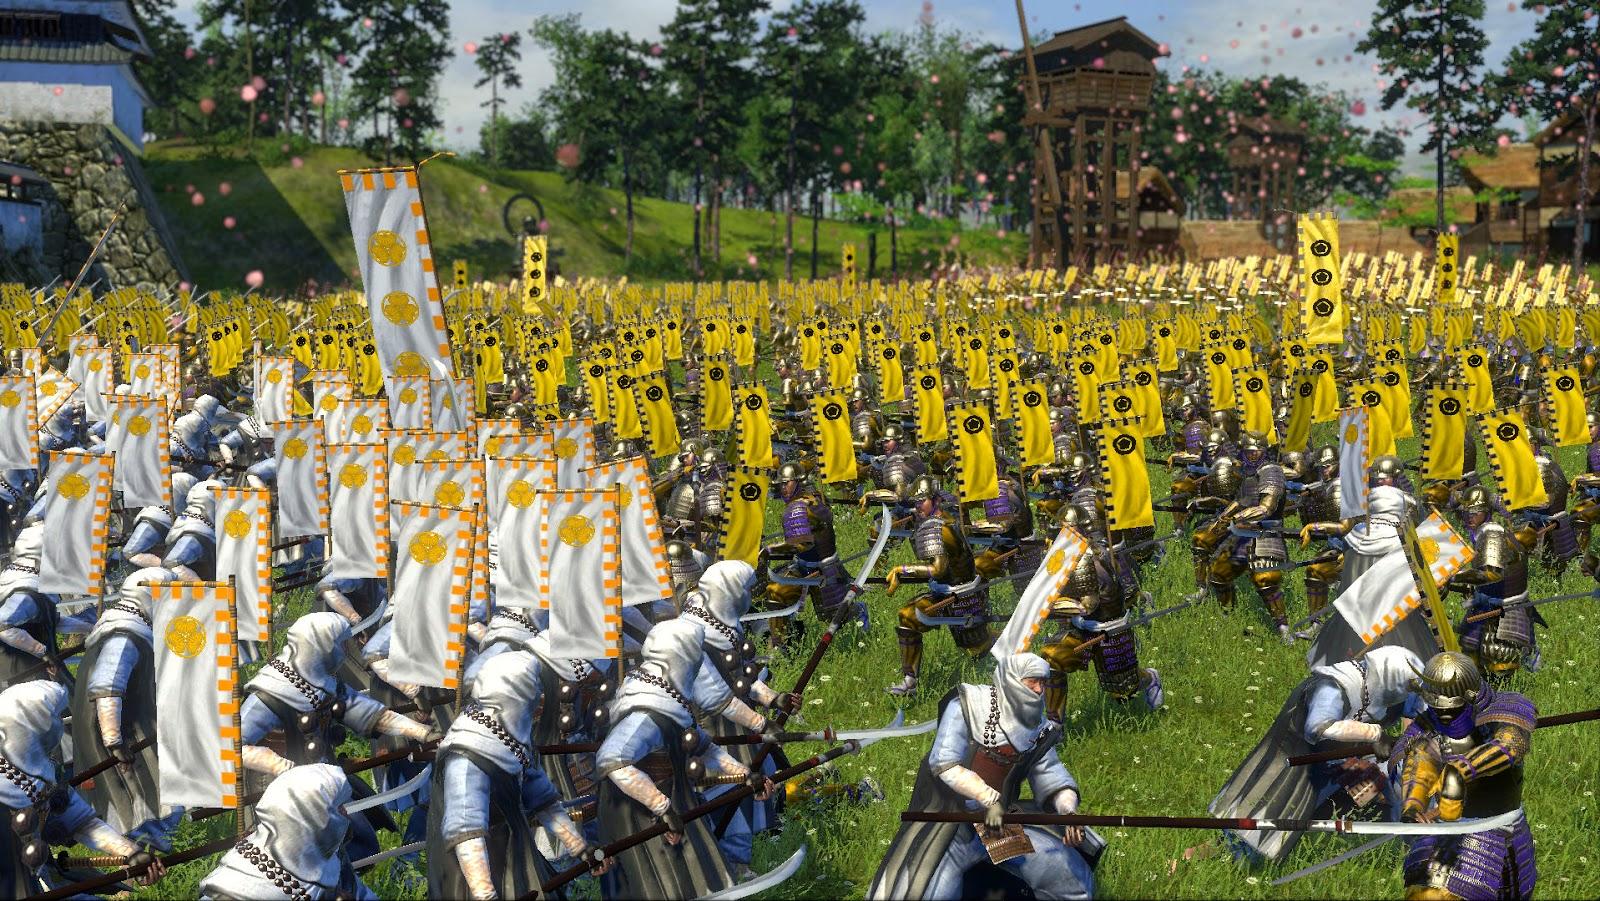 Shogun total war 1 full version